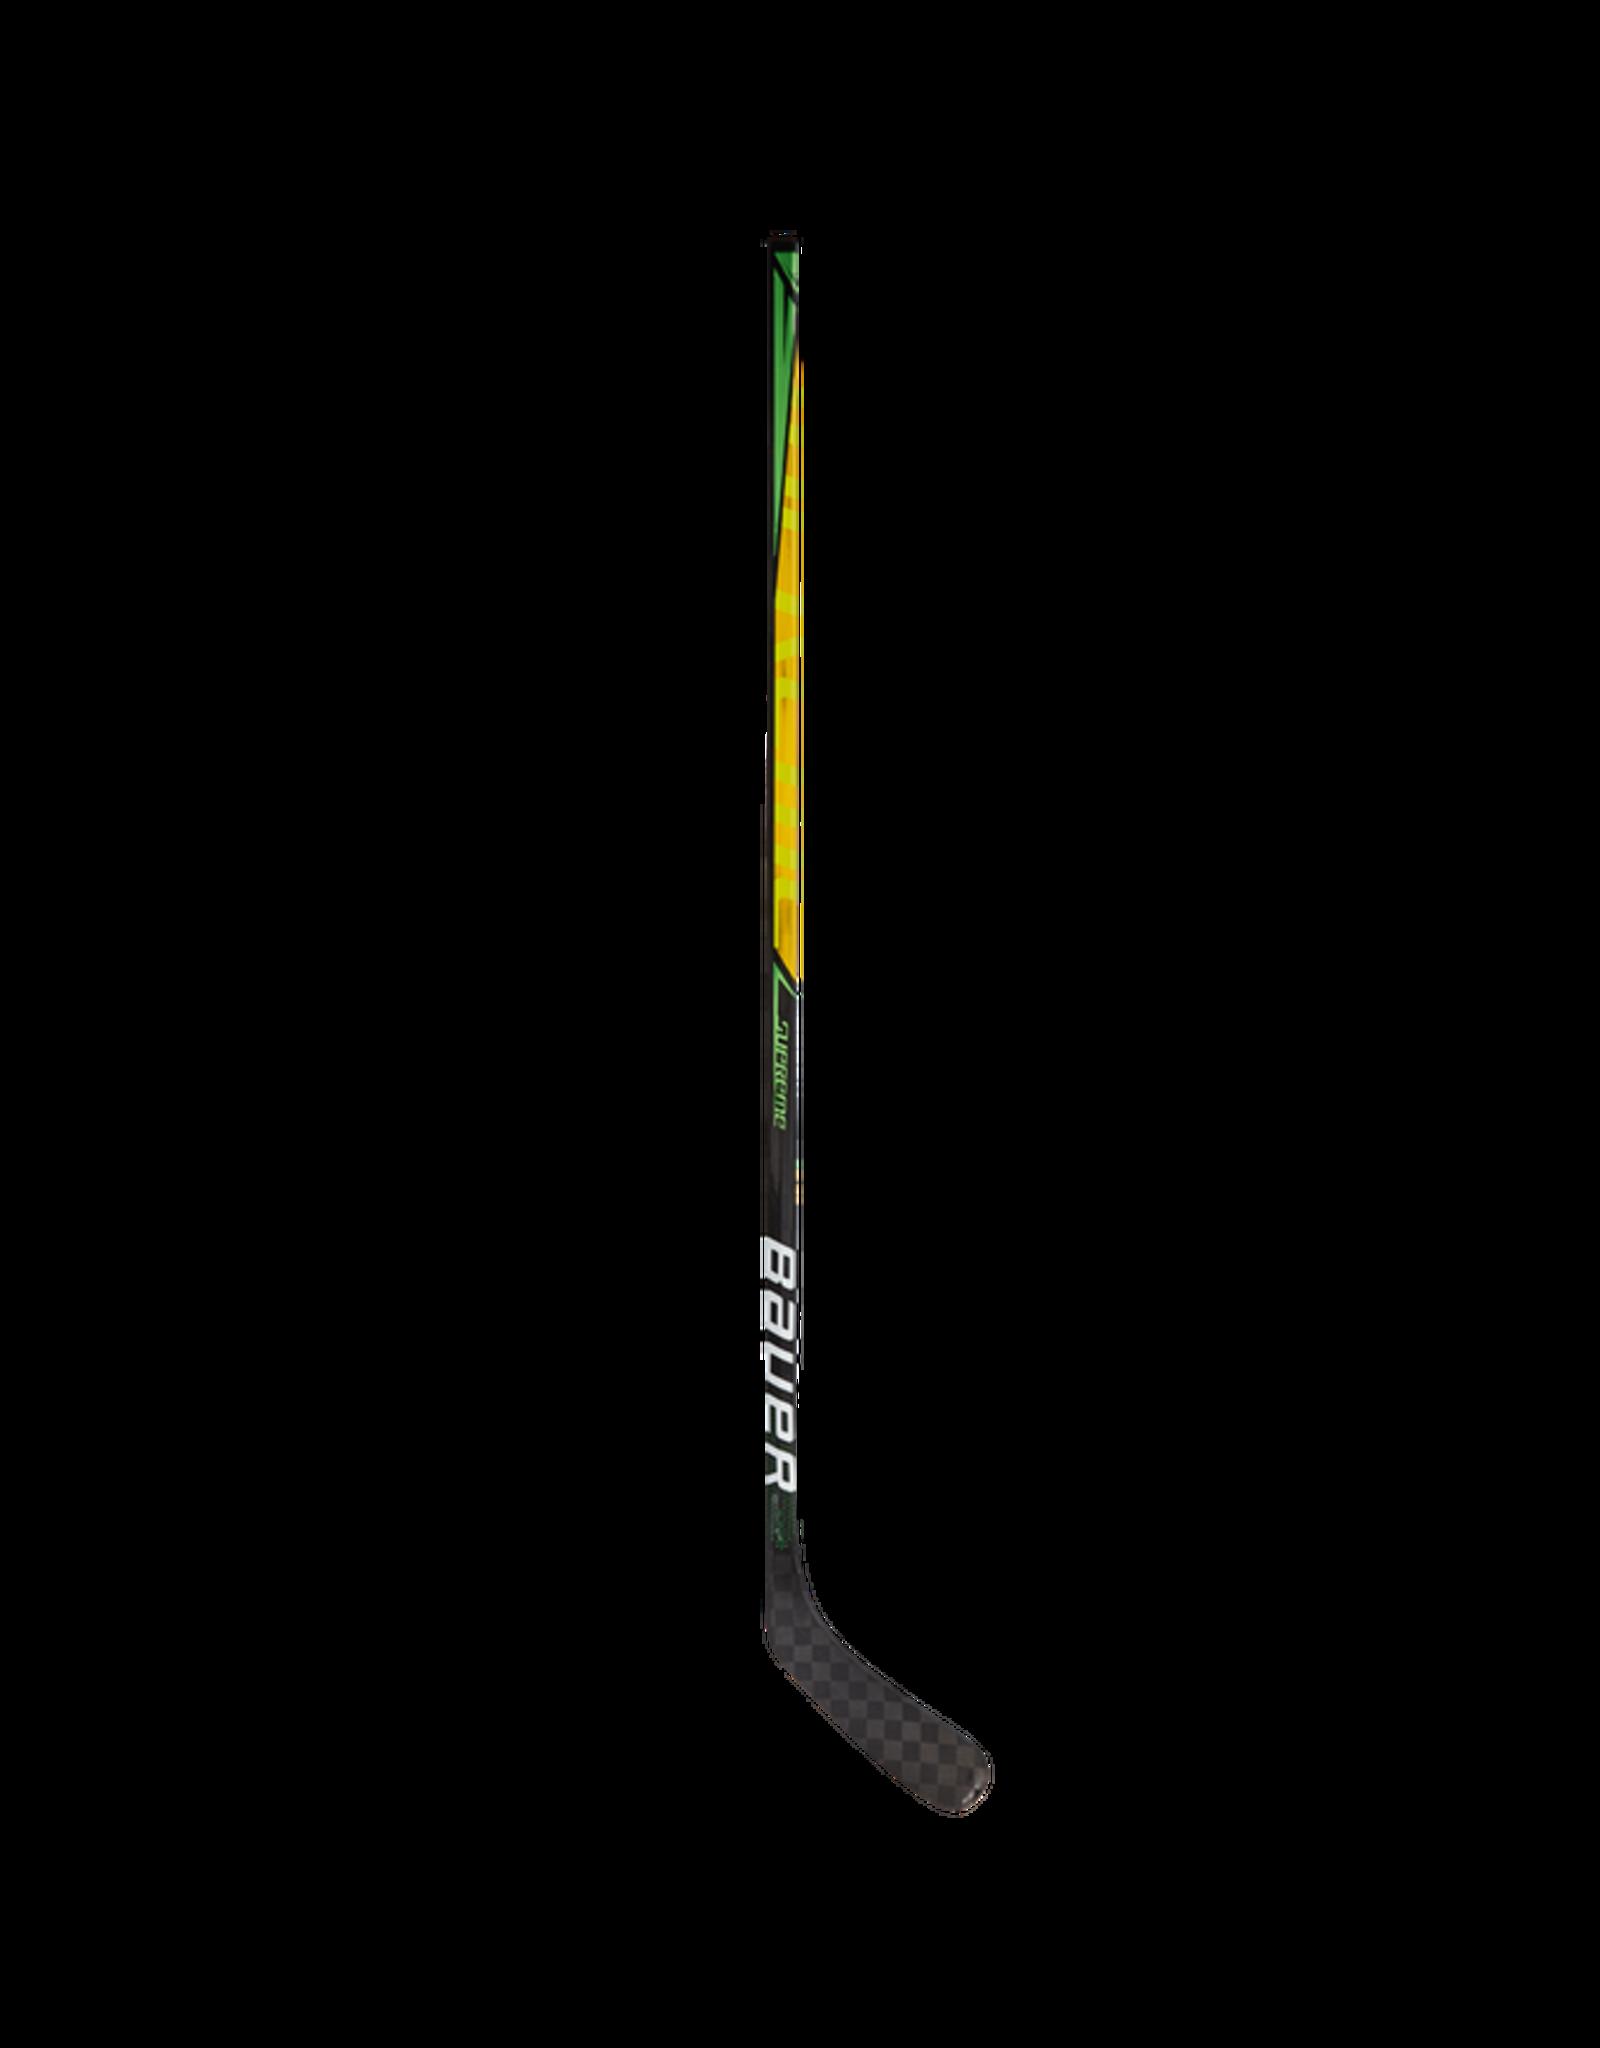 Bauer Hockey - Canada BAUER S20 SUPREME ULTRASONIC SR OPS